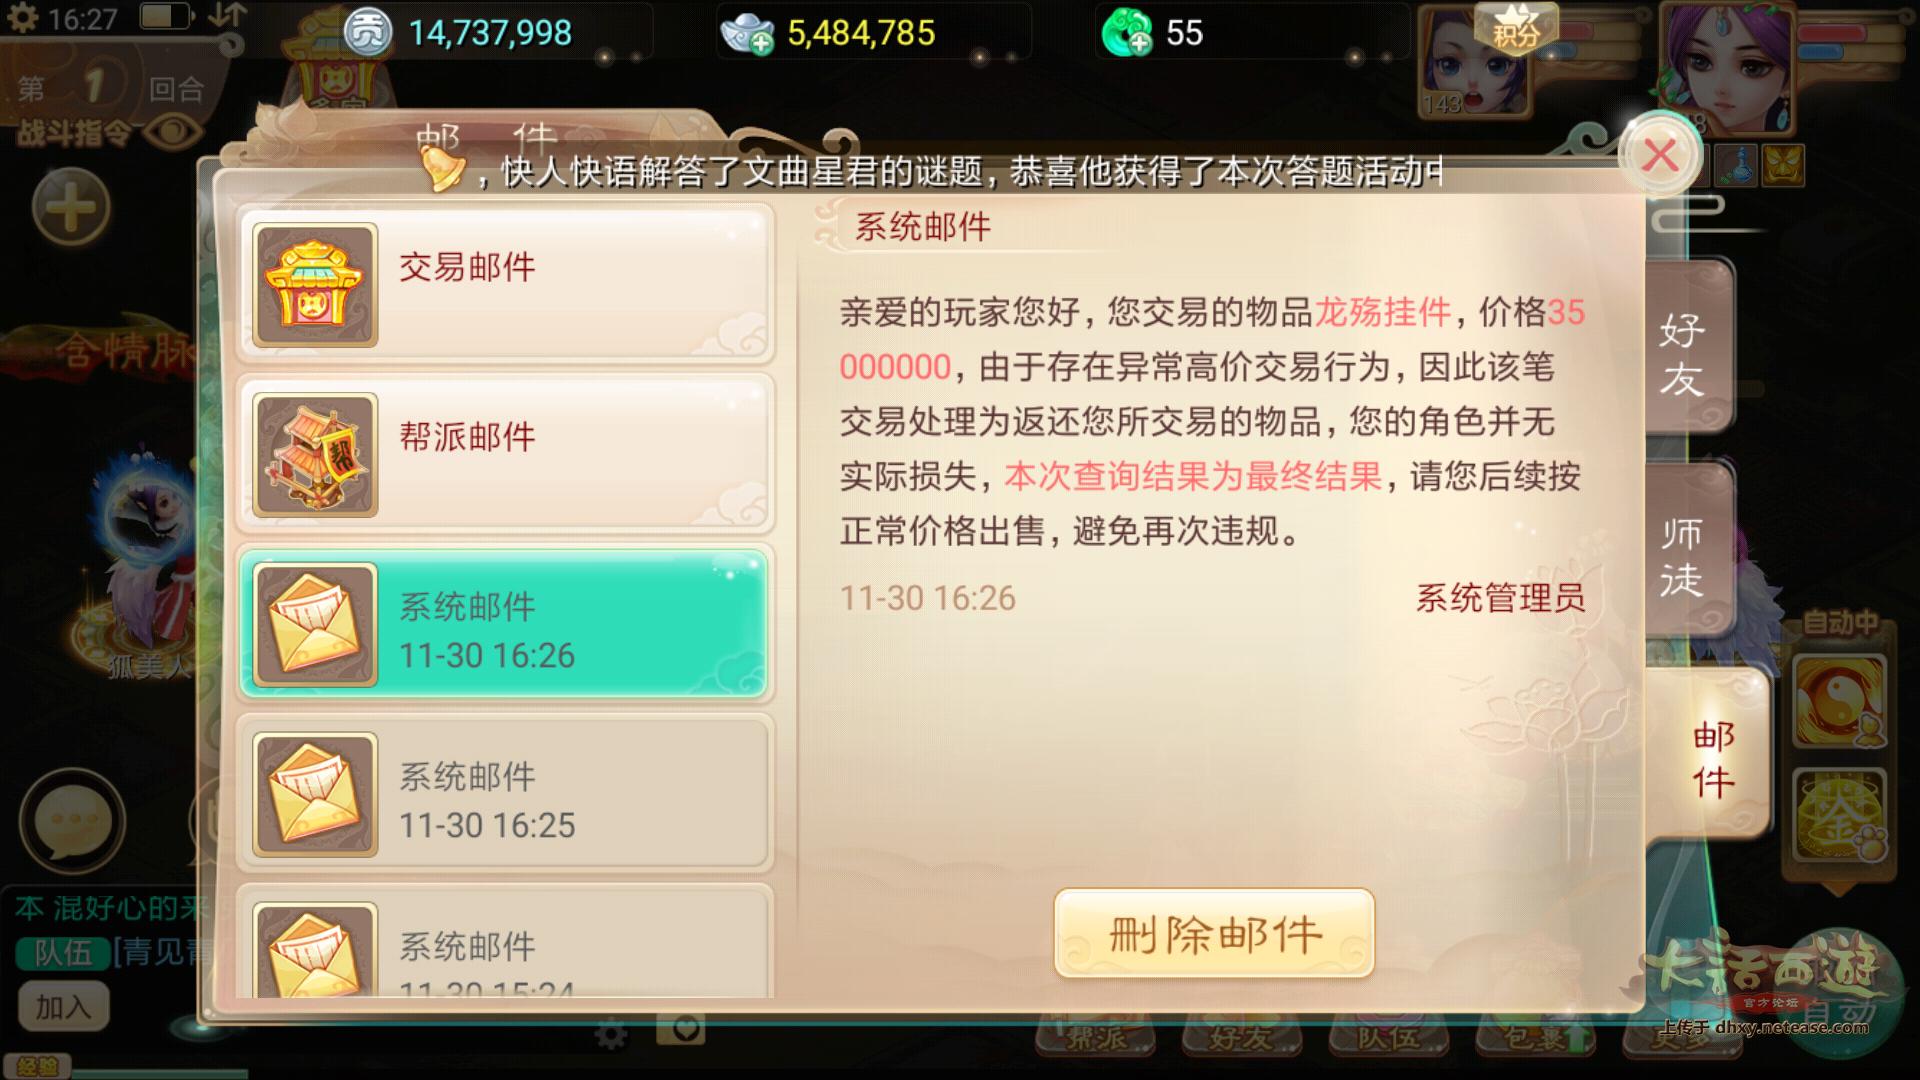 Screenshot_2019-11-30-16-27-48-004_com.netease.dhxy.png